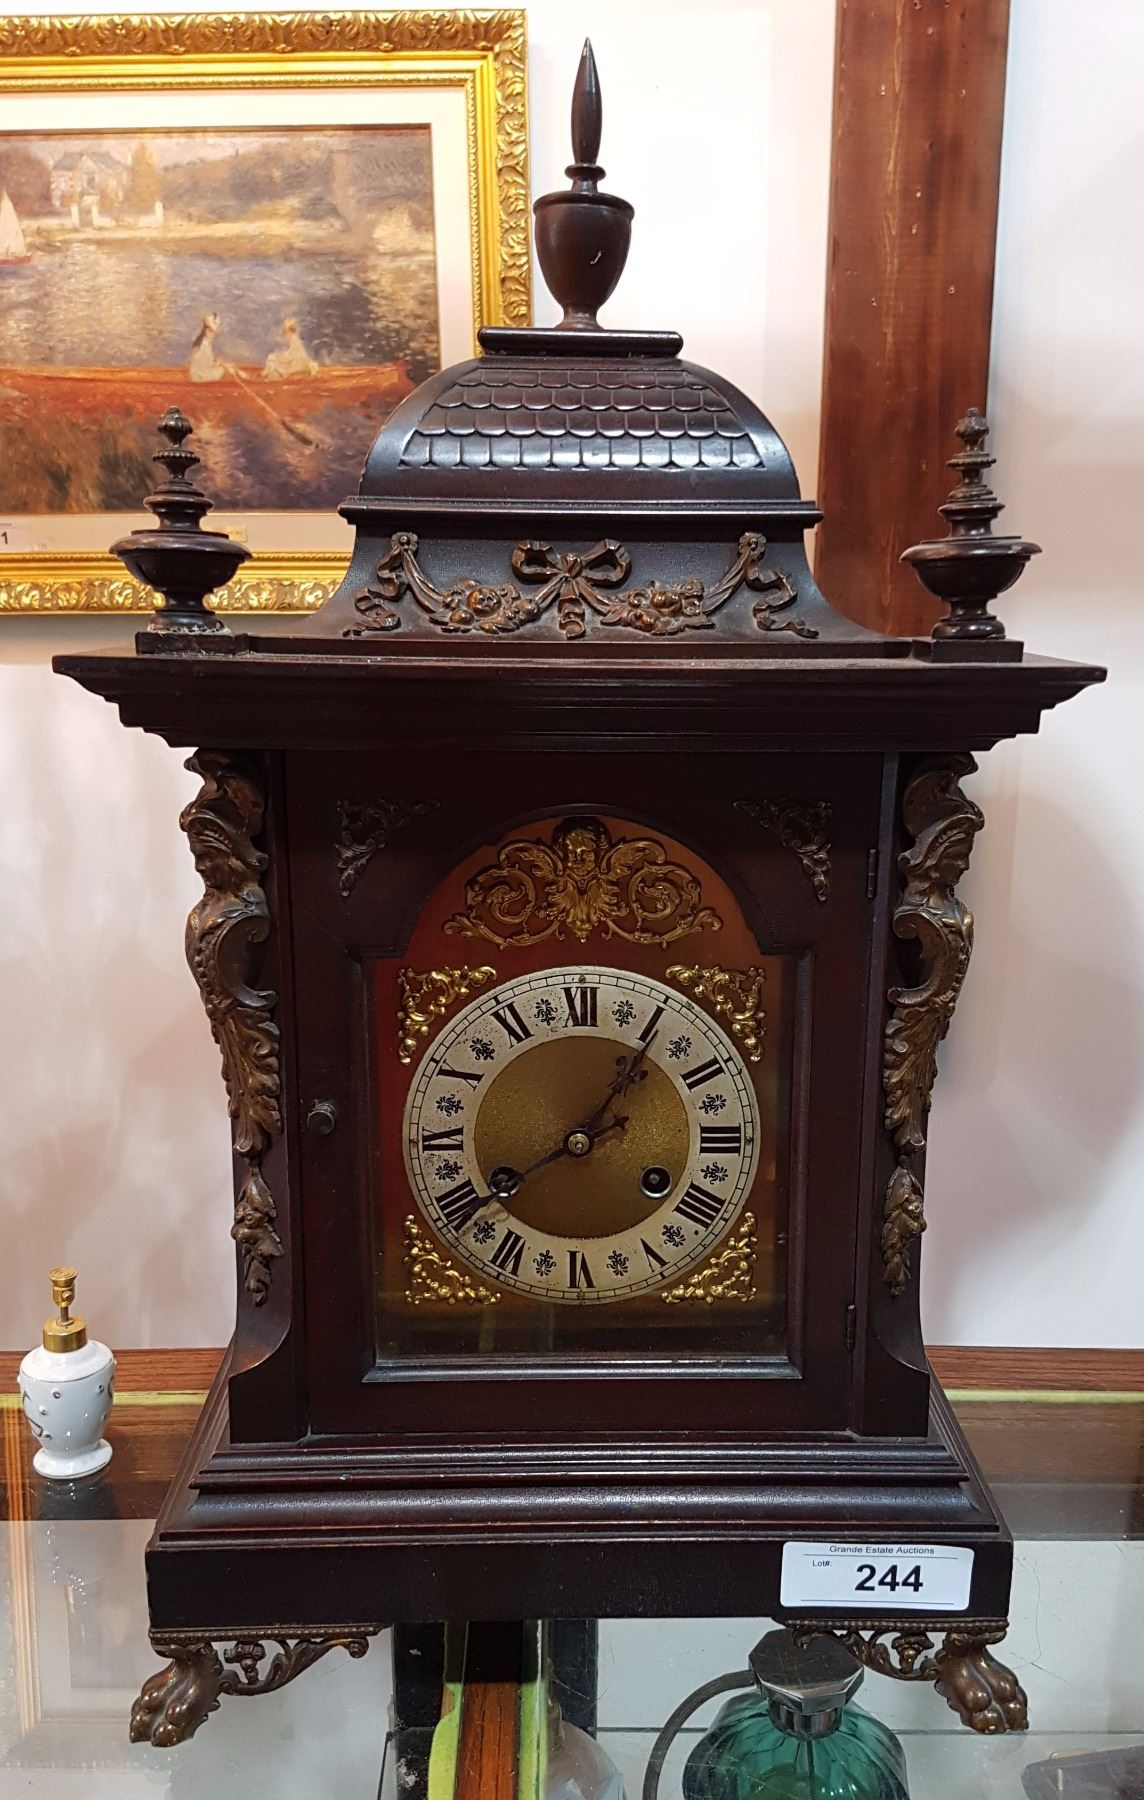 Image 1 Antique Mantle Clock Westminster Chimes No Key Pendulum